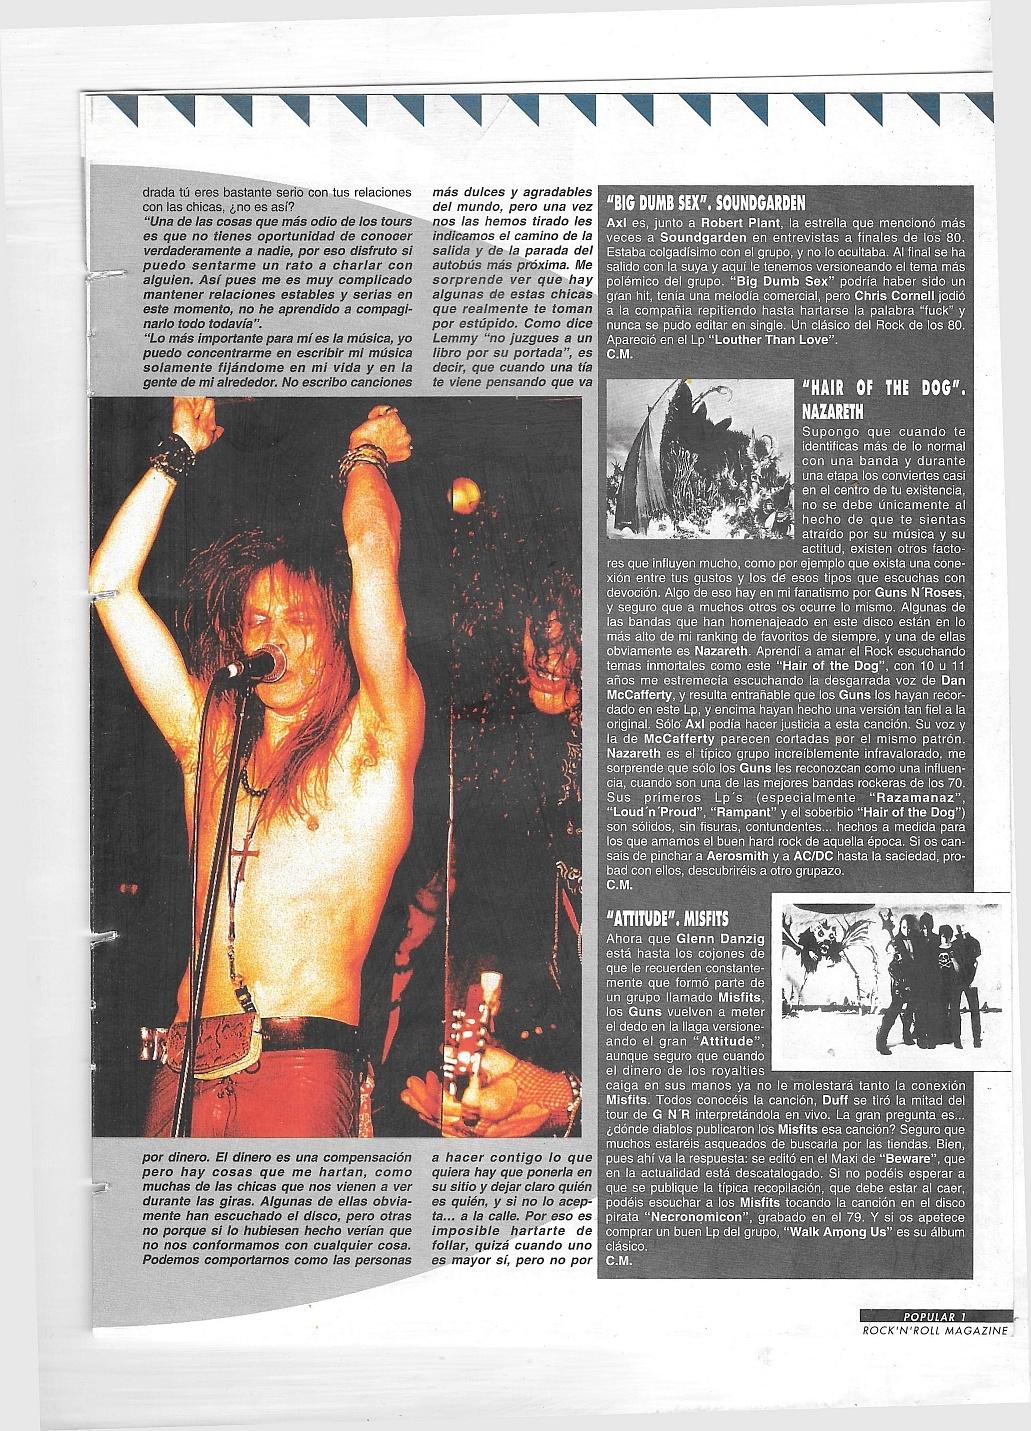 1988.04.DD - Popular 1 - Interview with Axl 1993_128